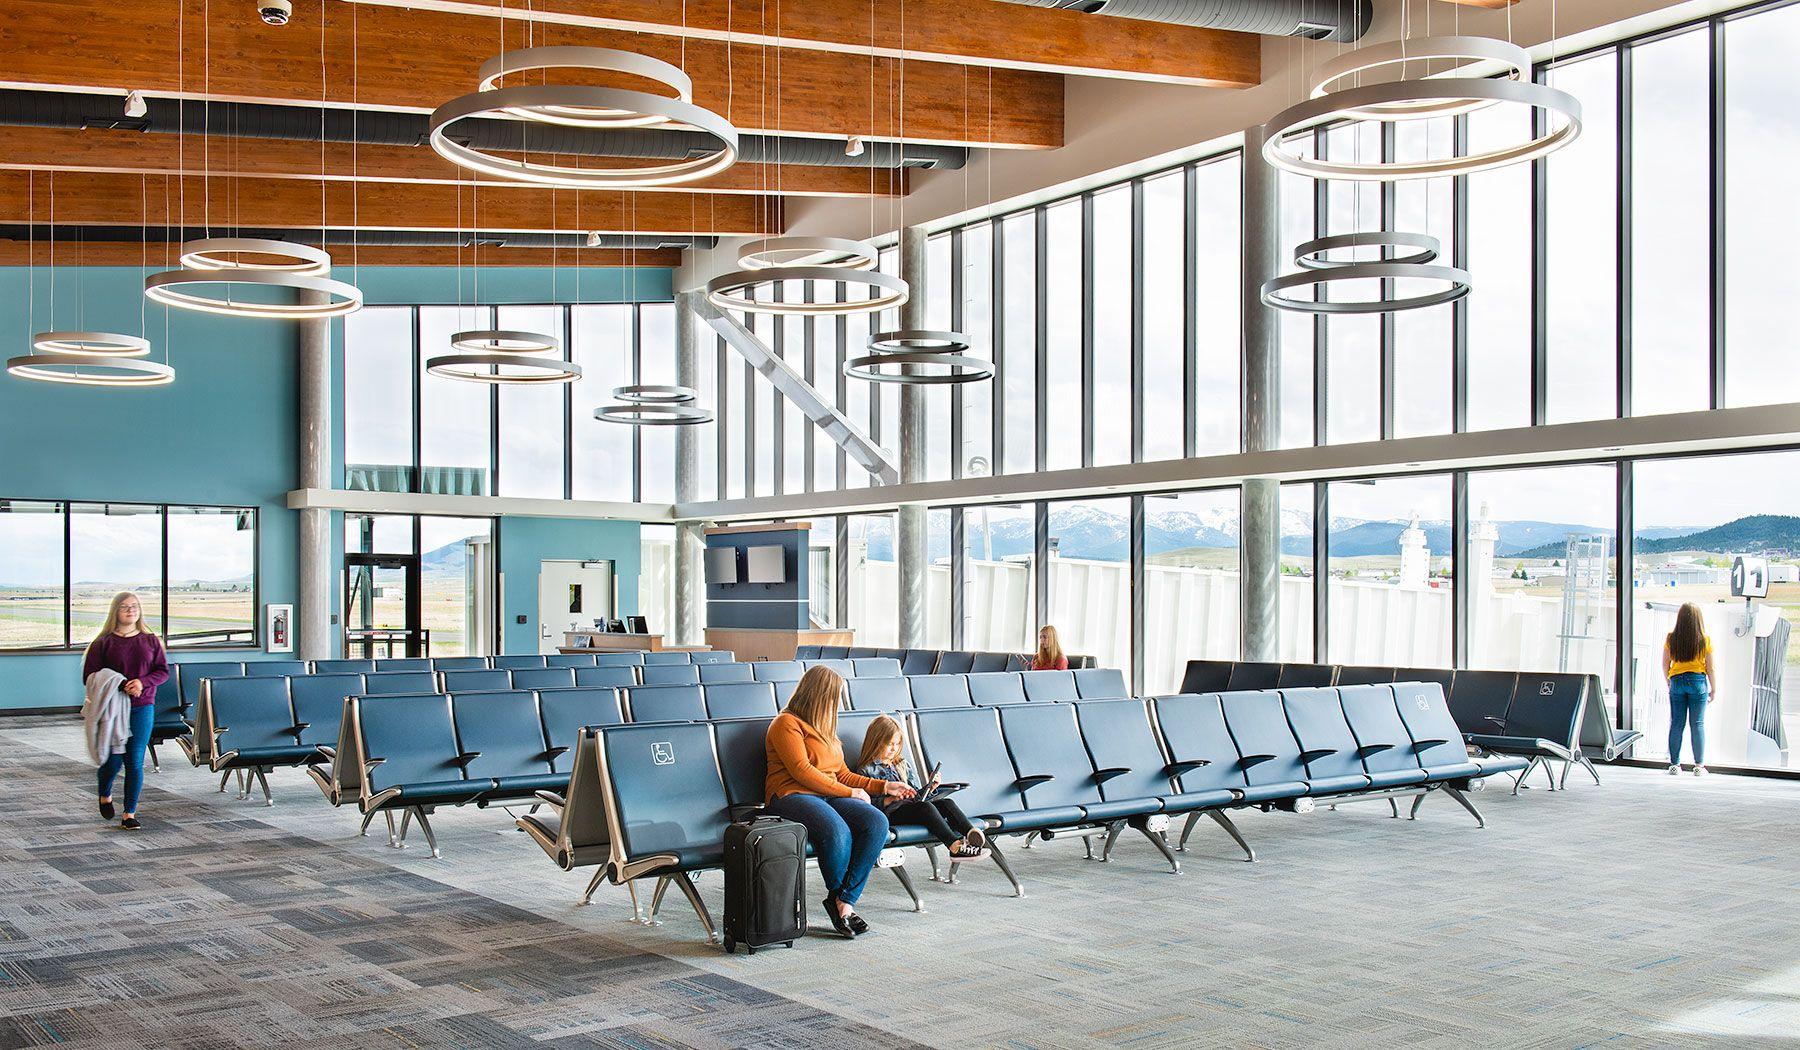 Helena Airport